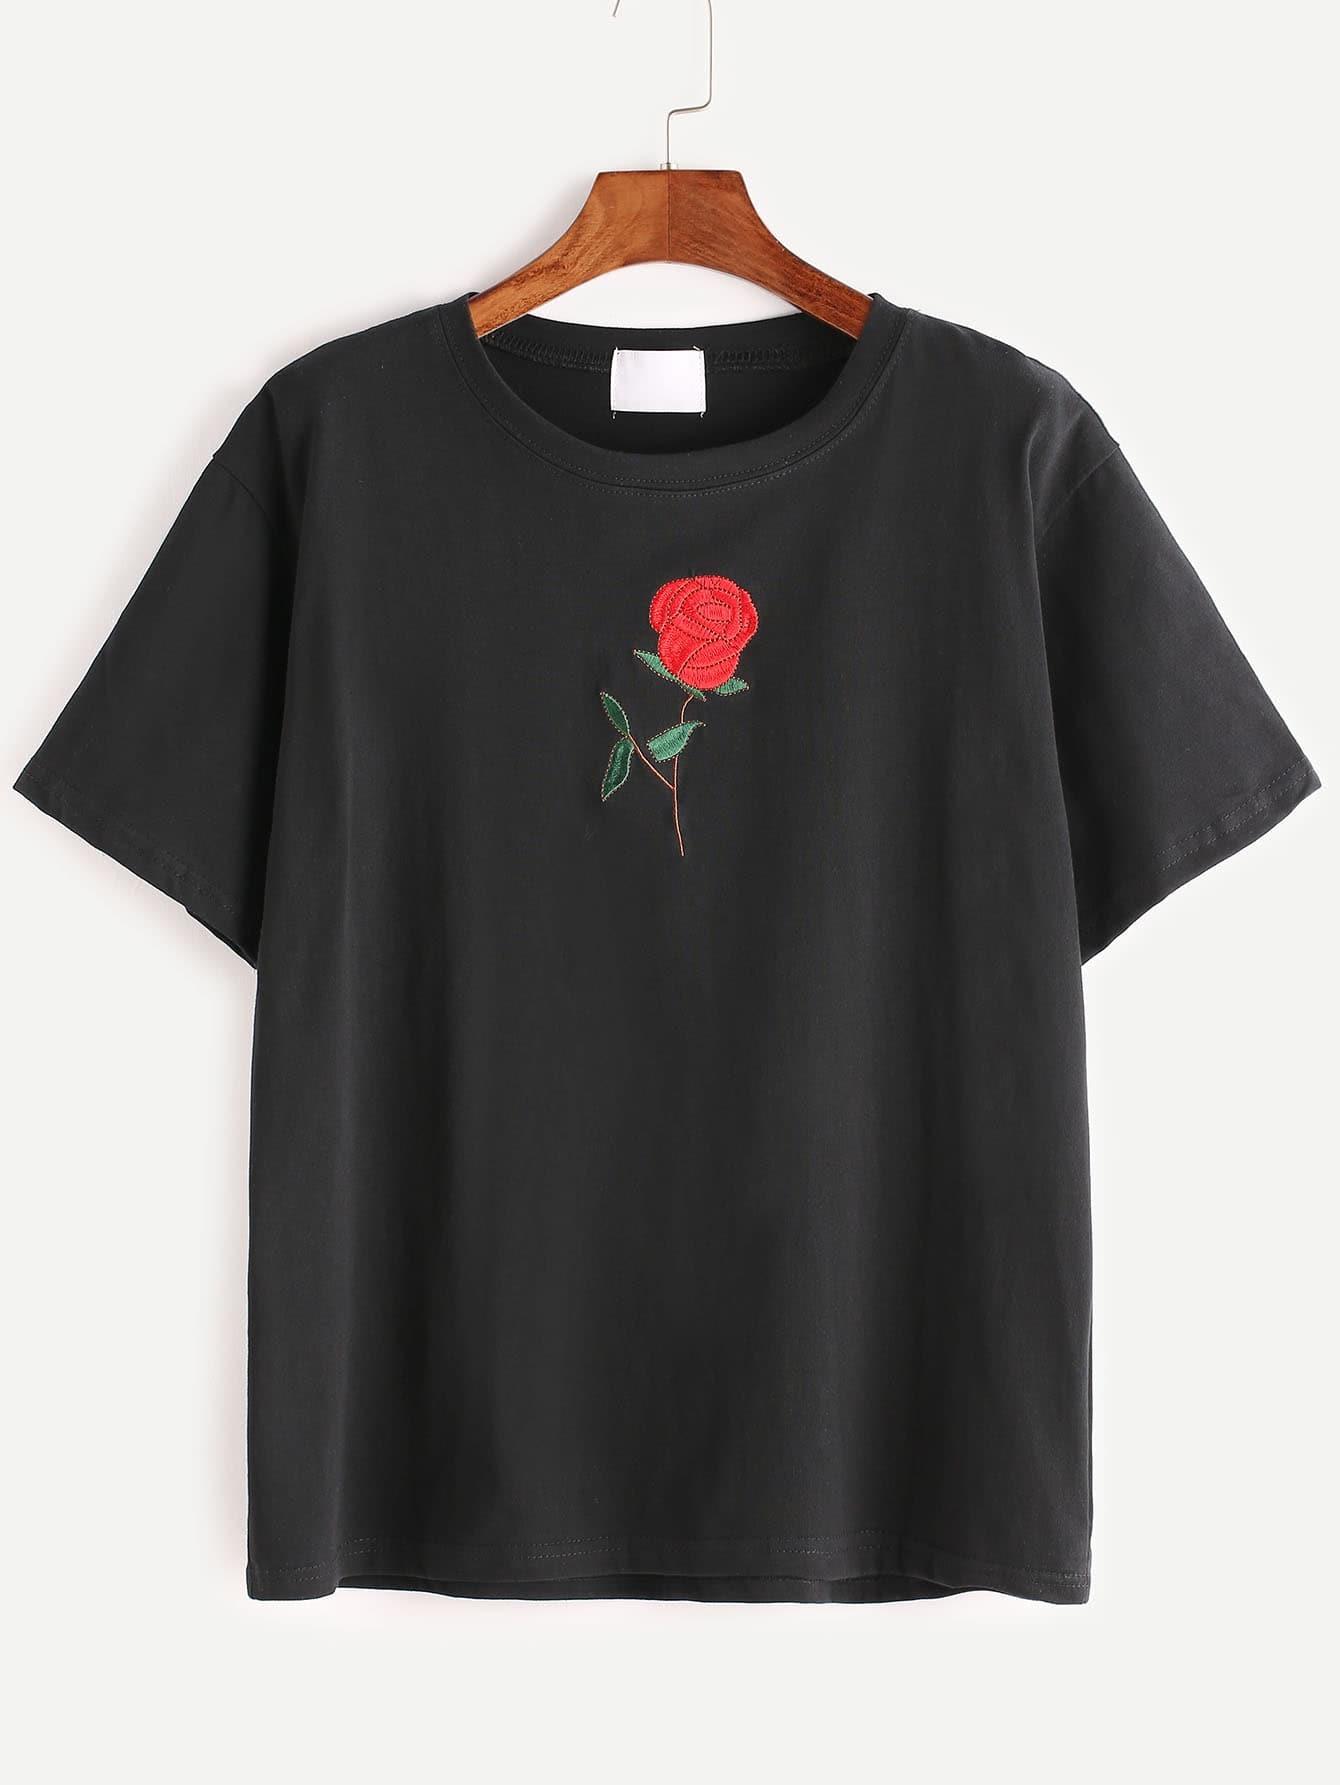 Black Rose Embroidered Short Sleeve T-shirtFor Women-romwe